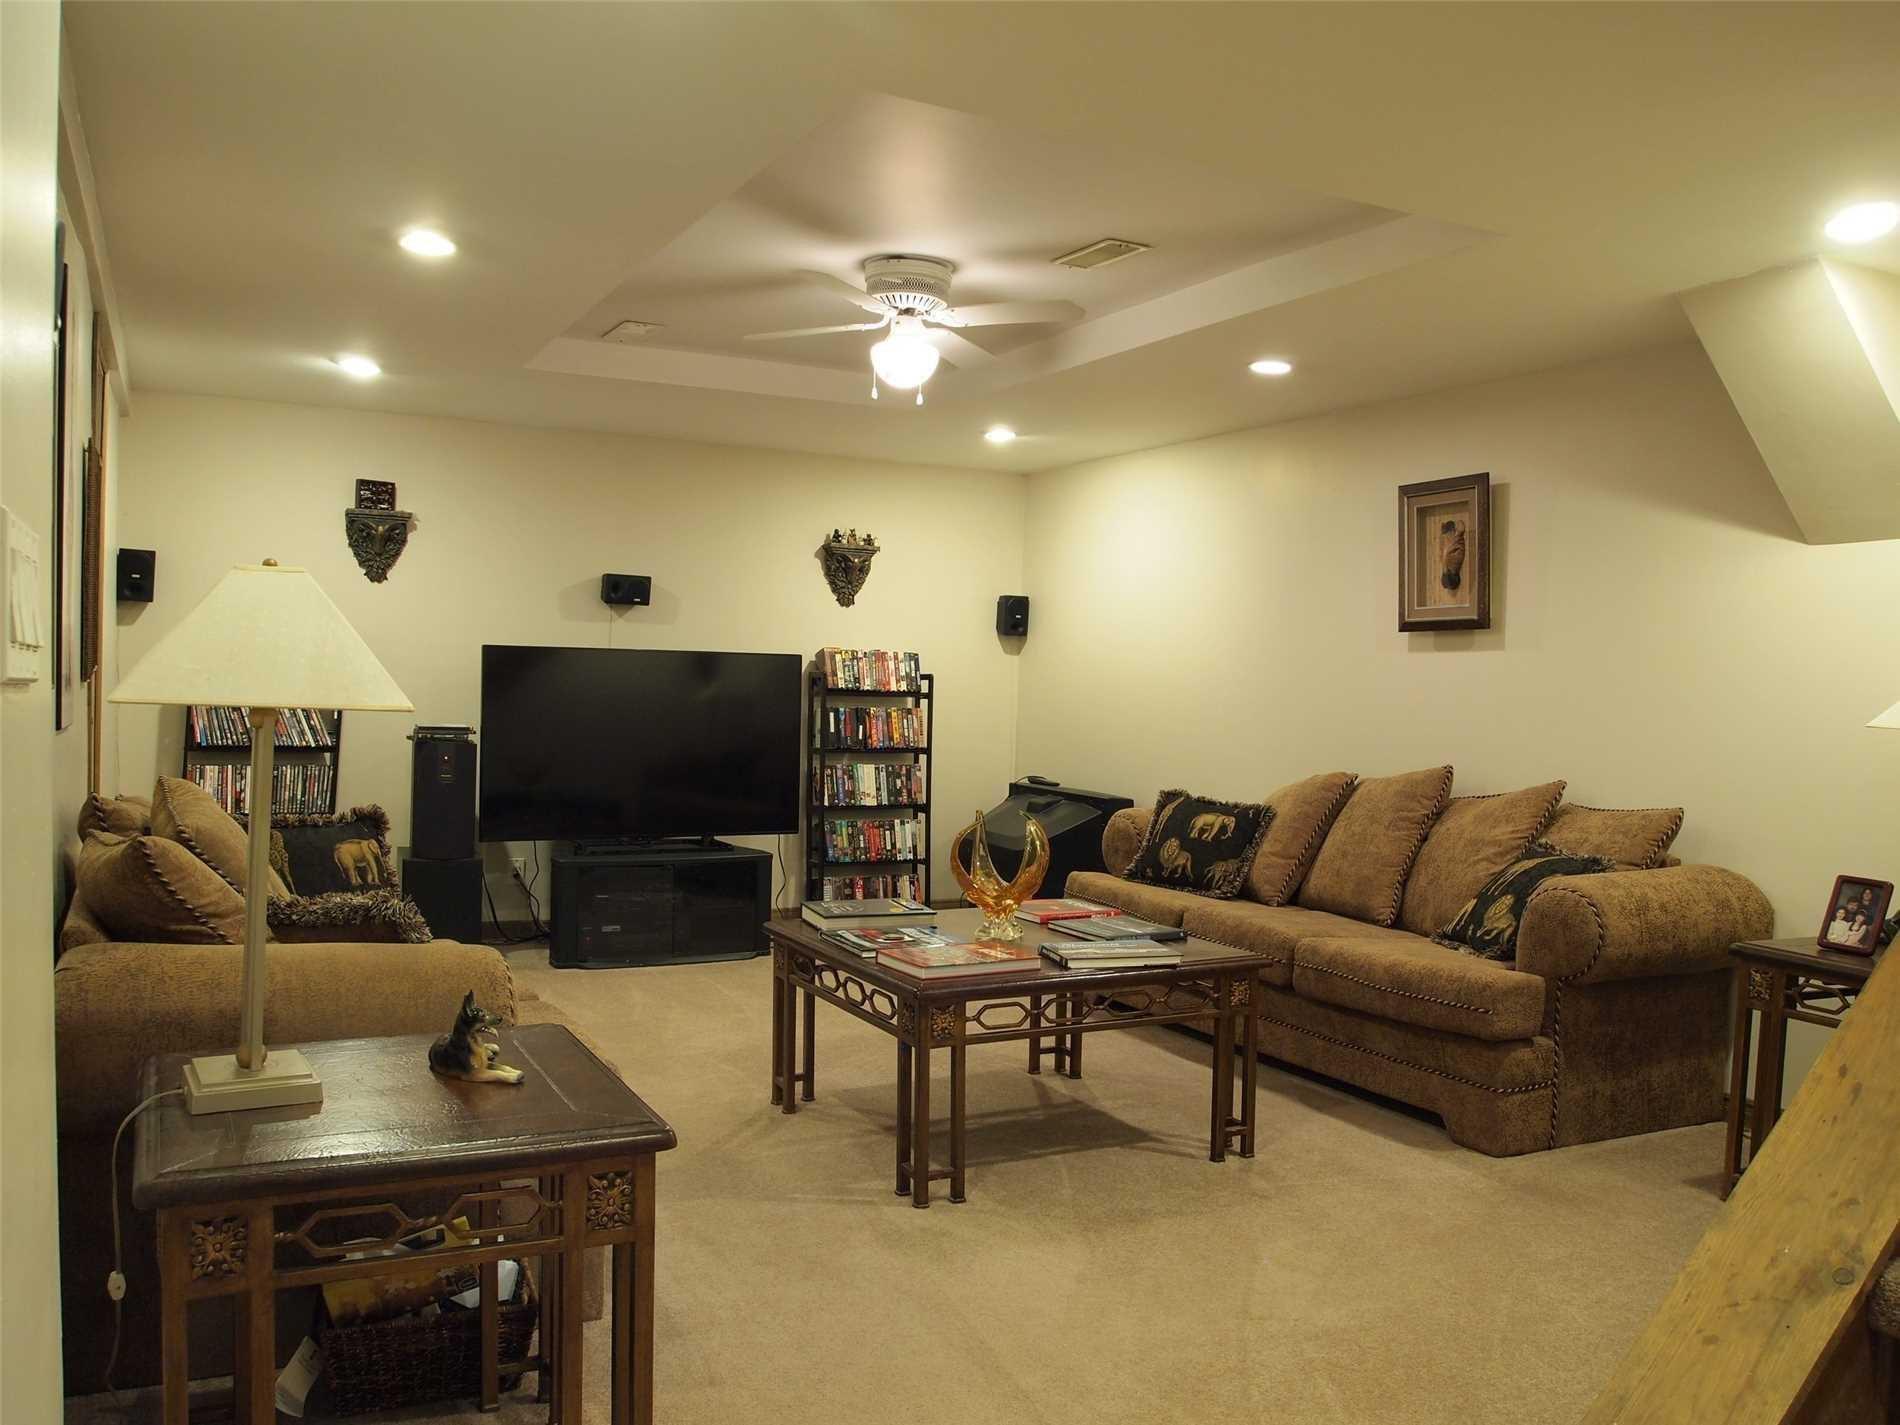 Photo 15: Photos: 105 Fifth Street in Brock: Beaverton House (Bungalow) for sale : MLS®# N4564596